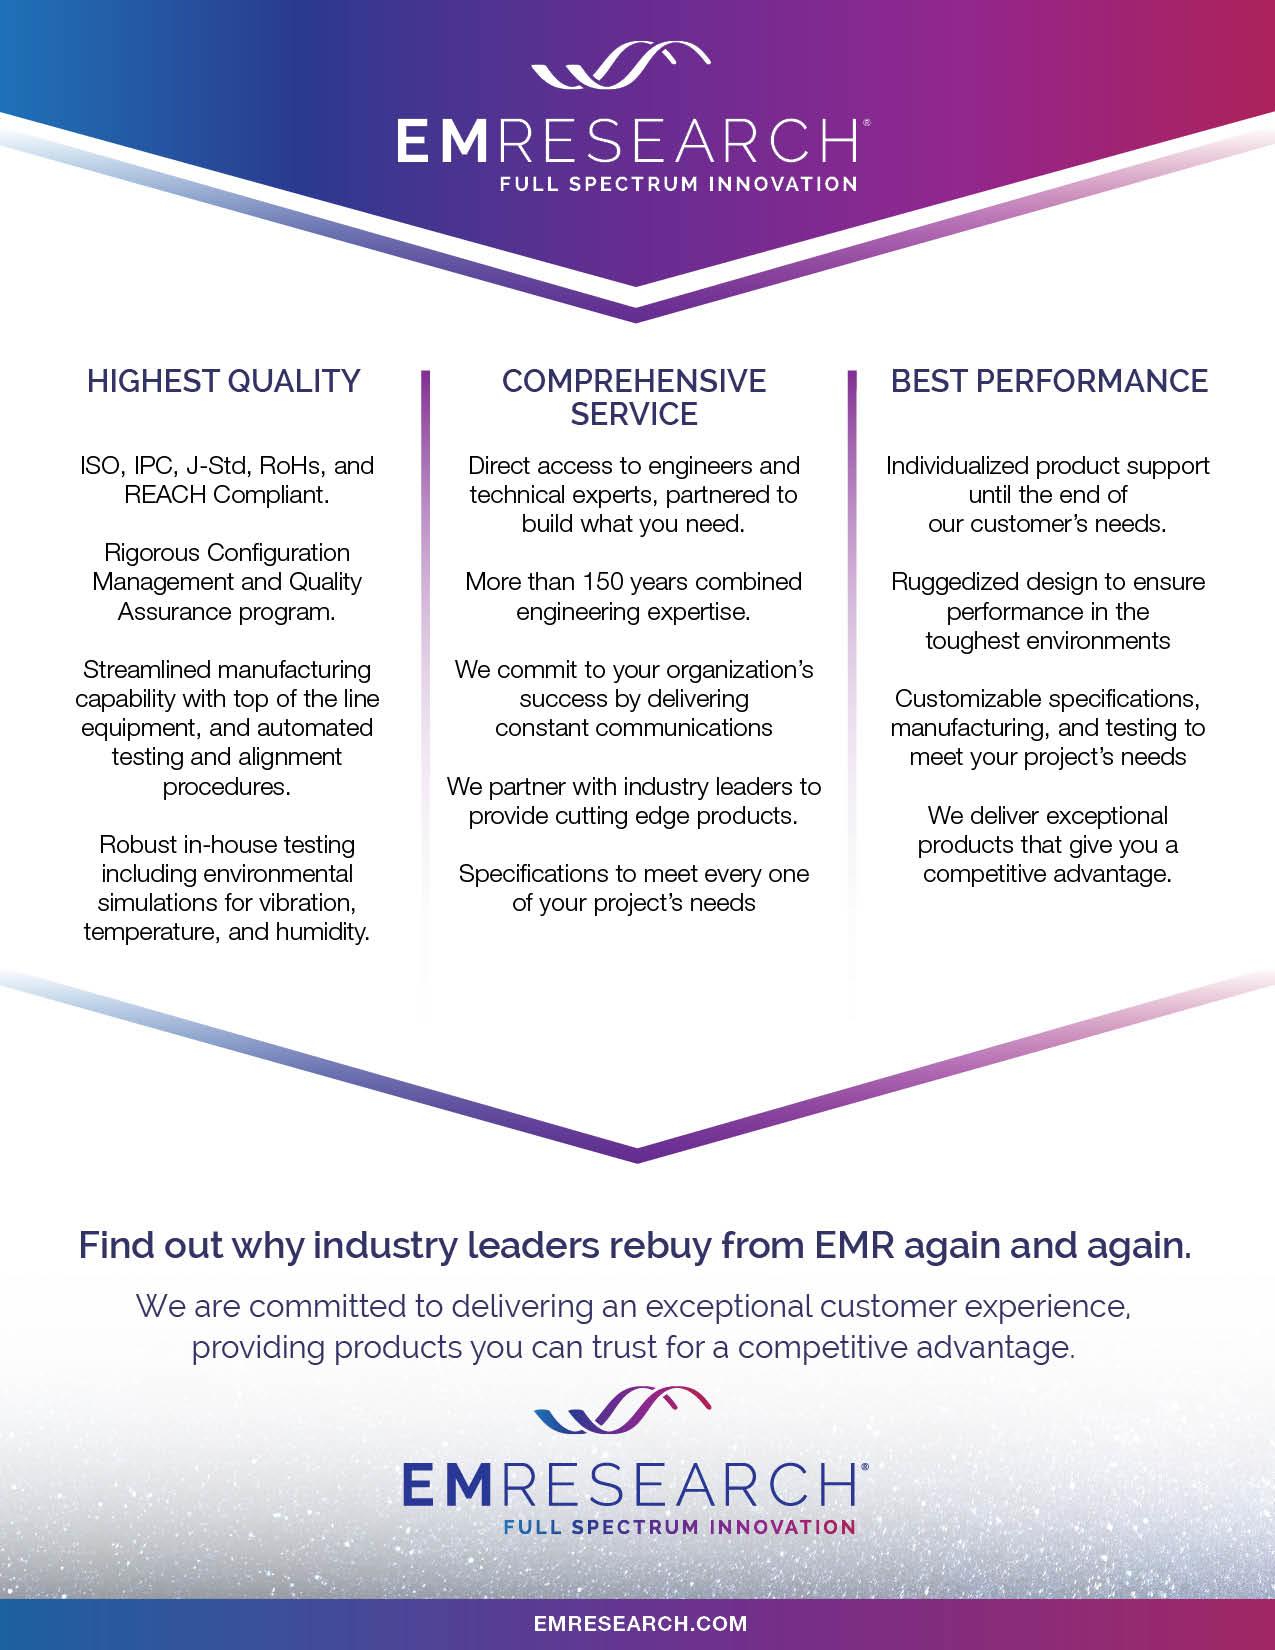 EM Research Customer Facing Brand Message